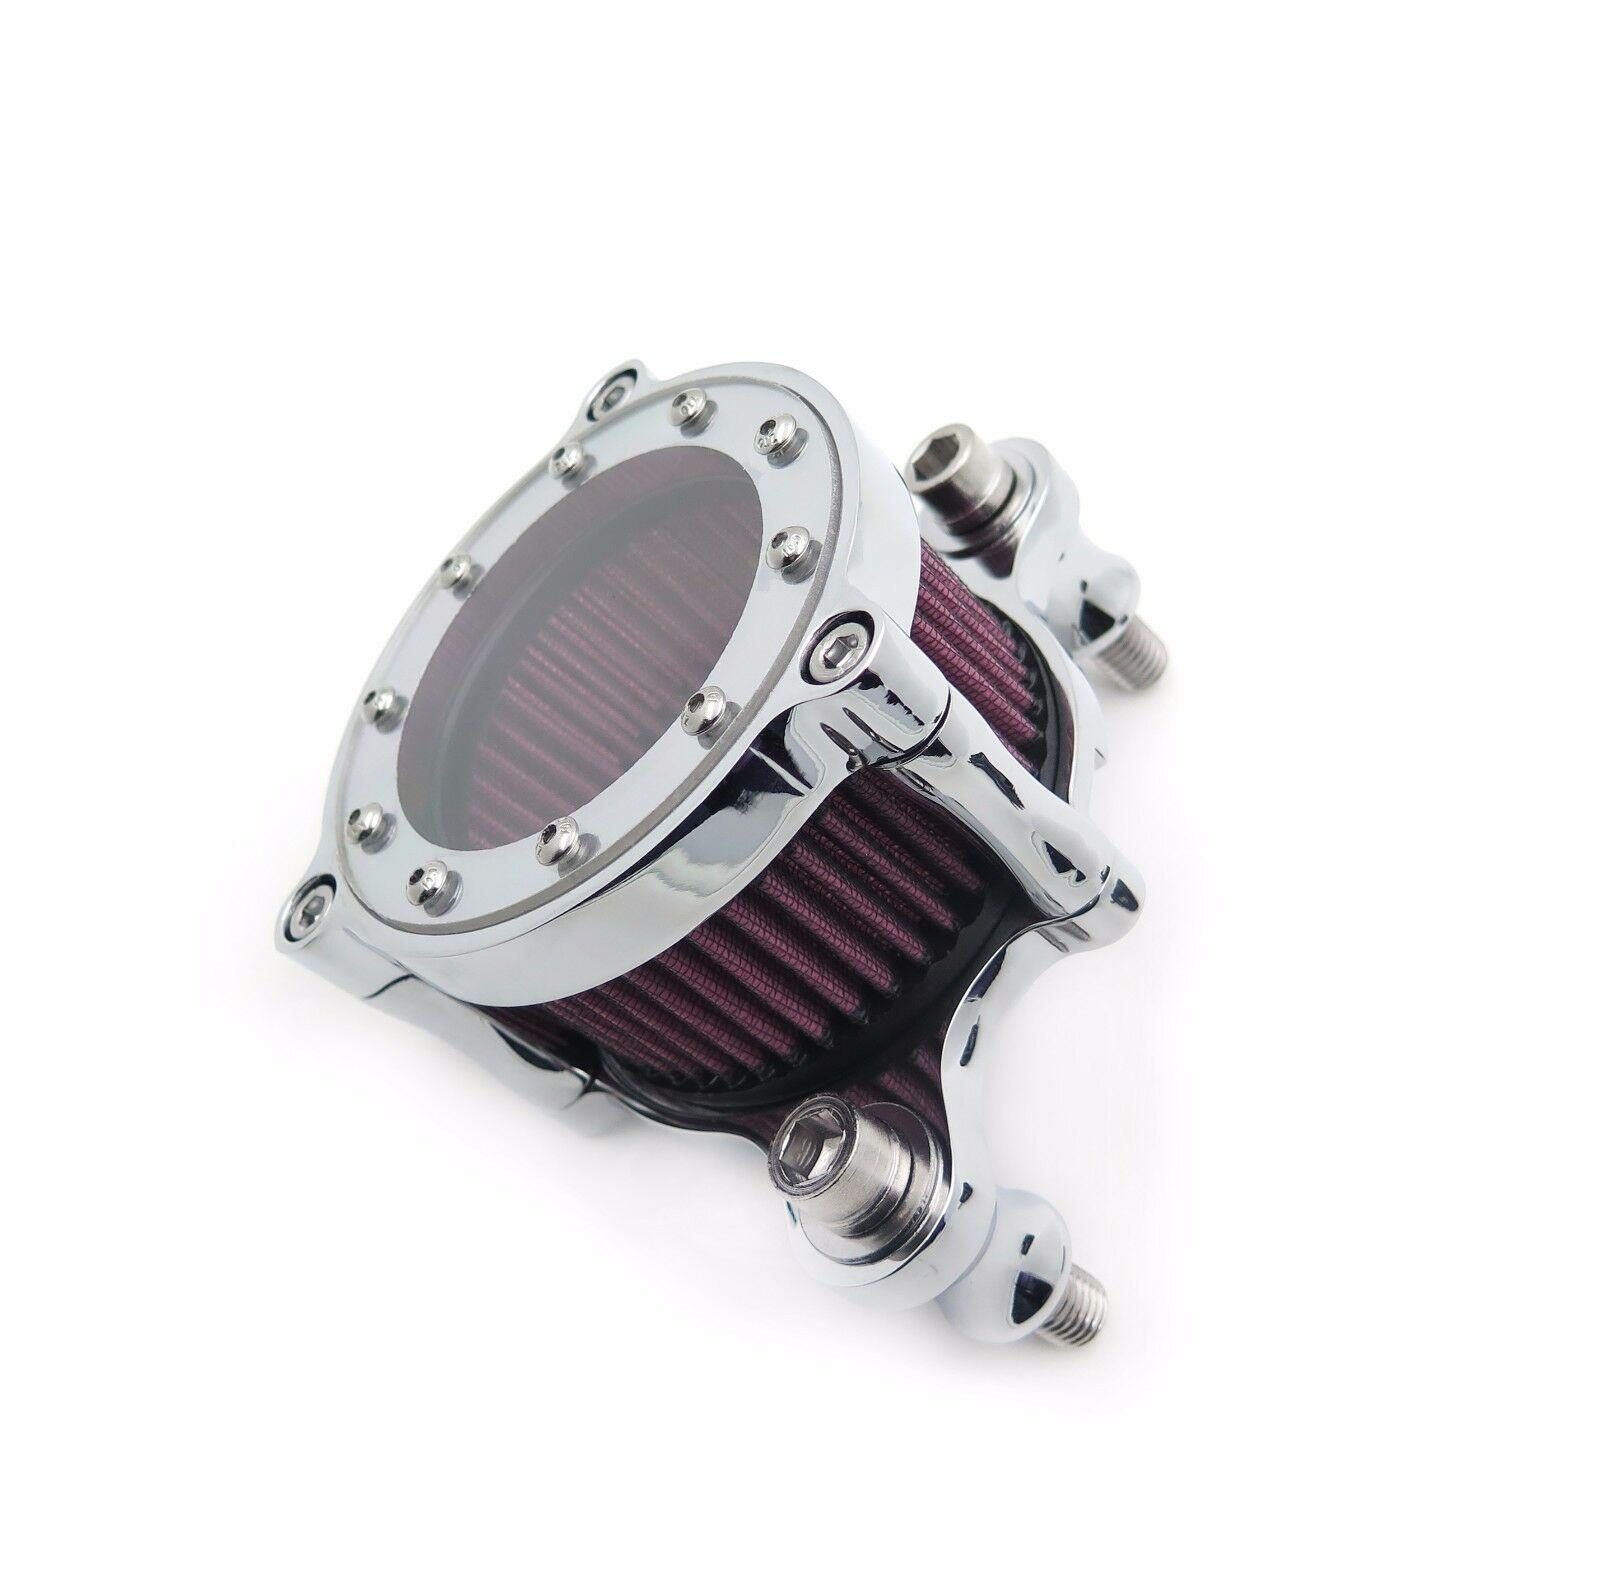 Air Cleaner Intake Filter Motorcycle Air Filter silver